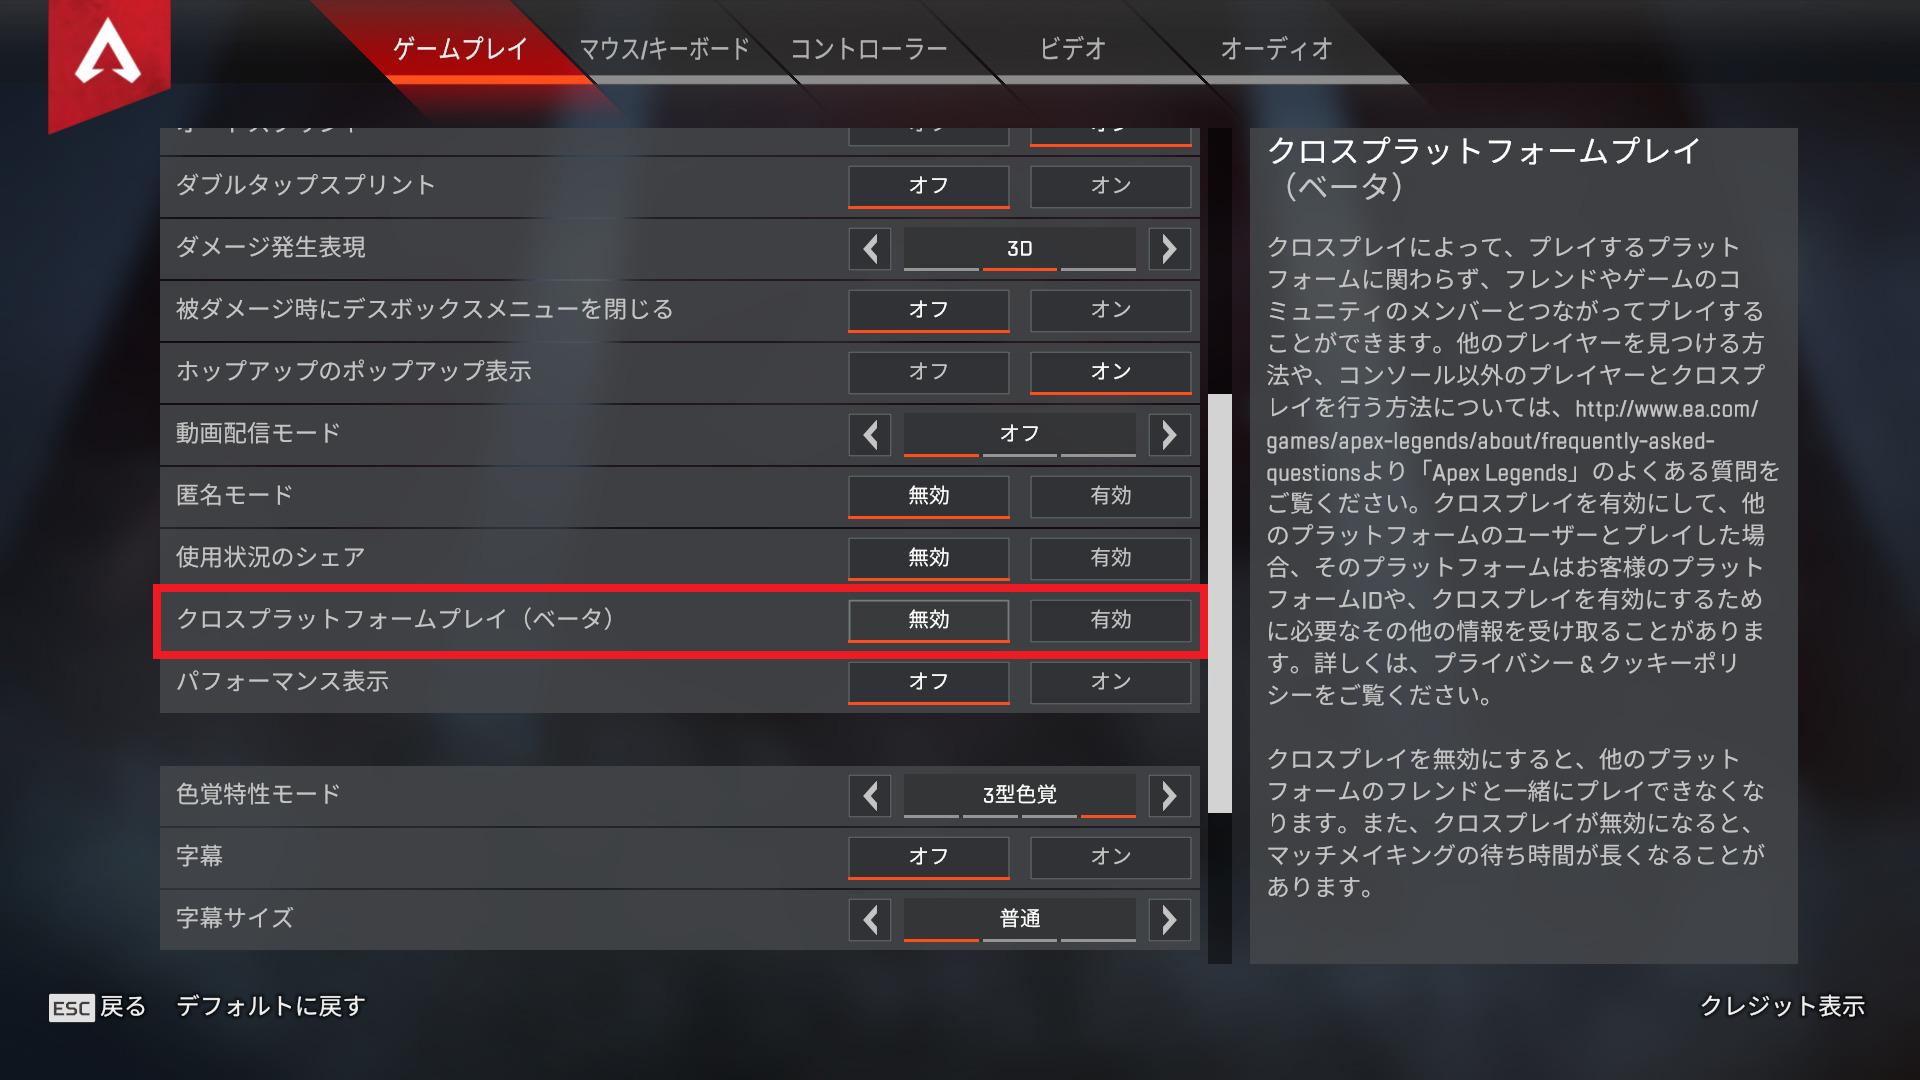 【APEX LEGENDS】クロスプレイは無効(オフ)にできる?クロスプレイをオフにする方法